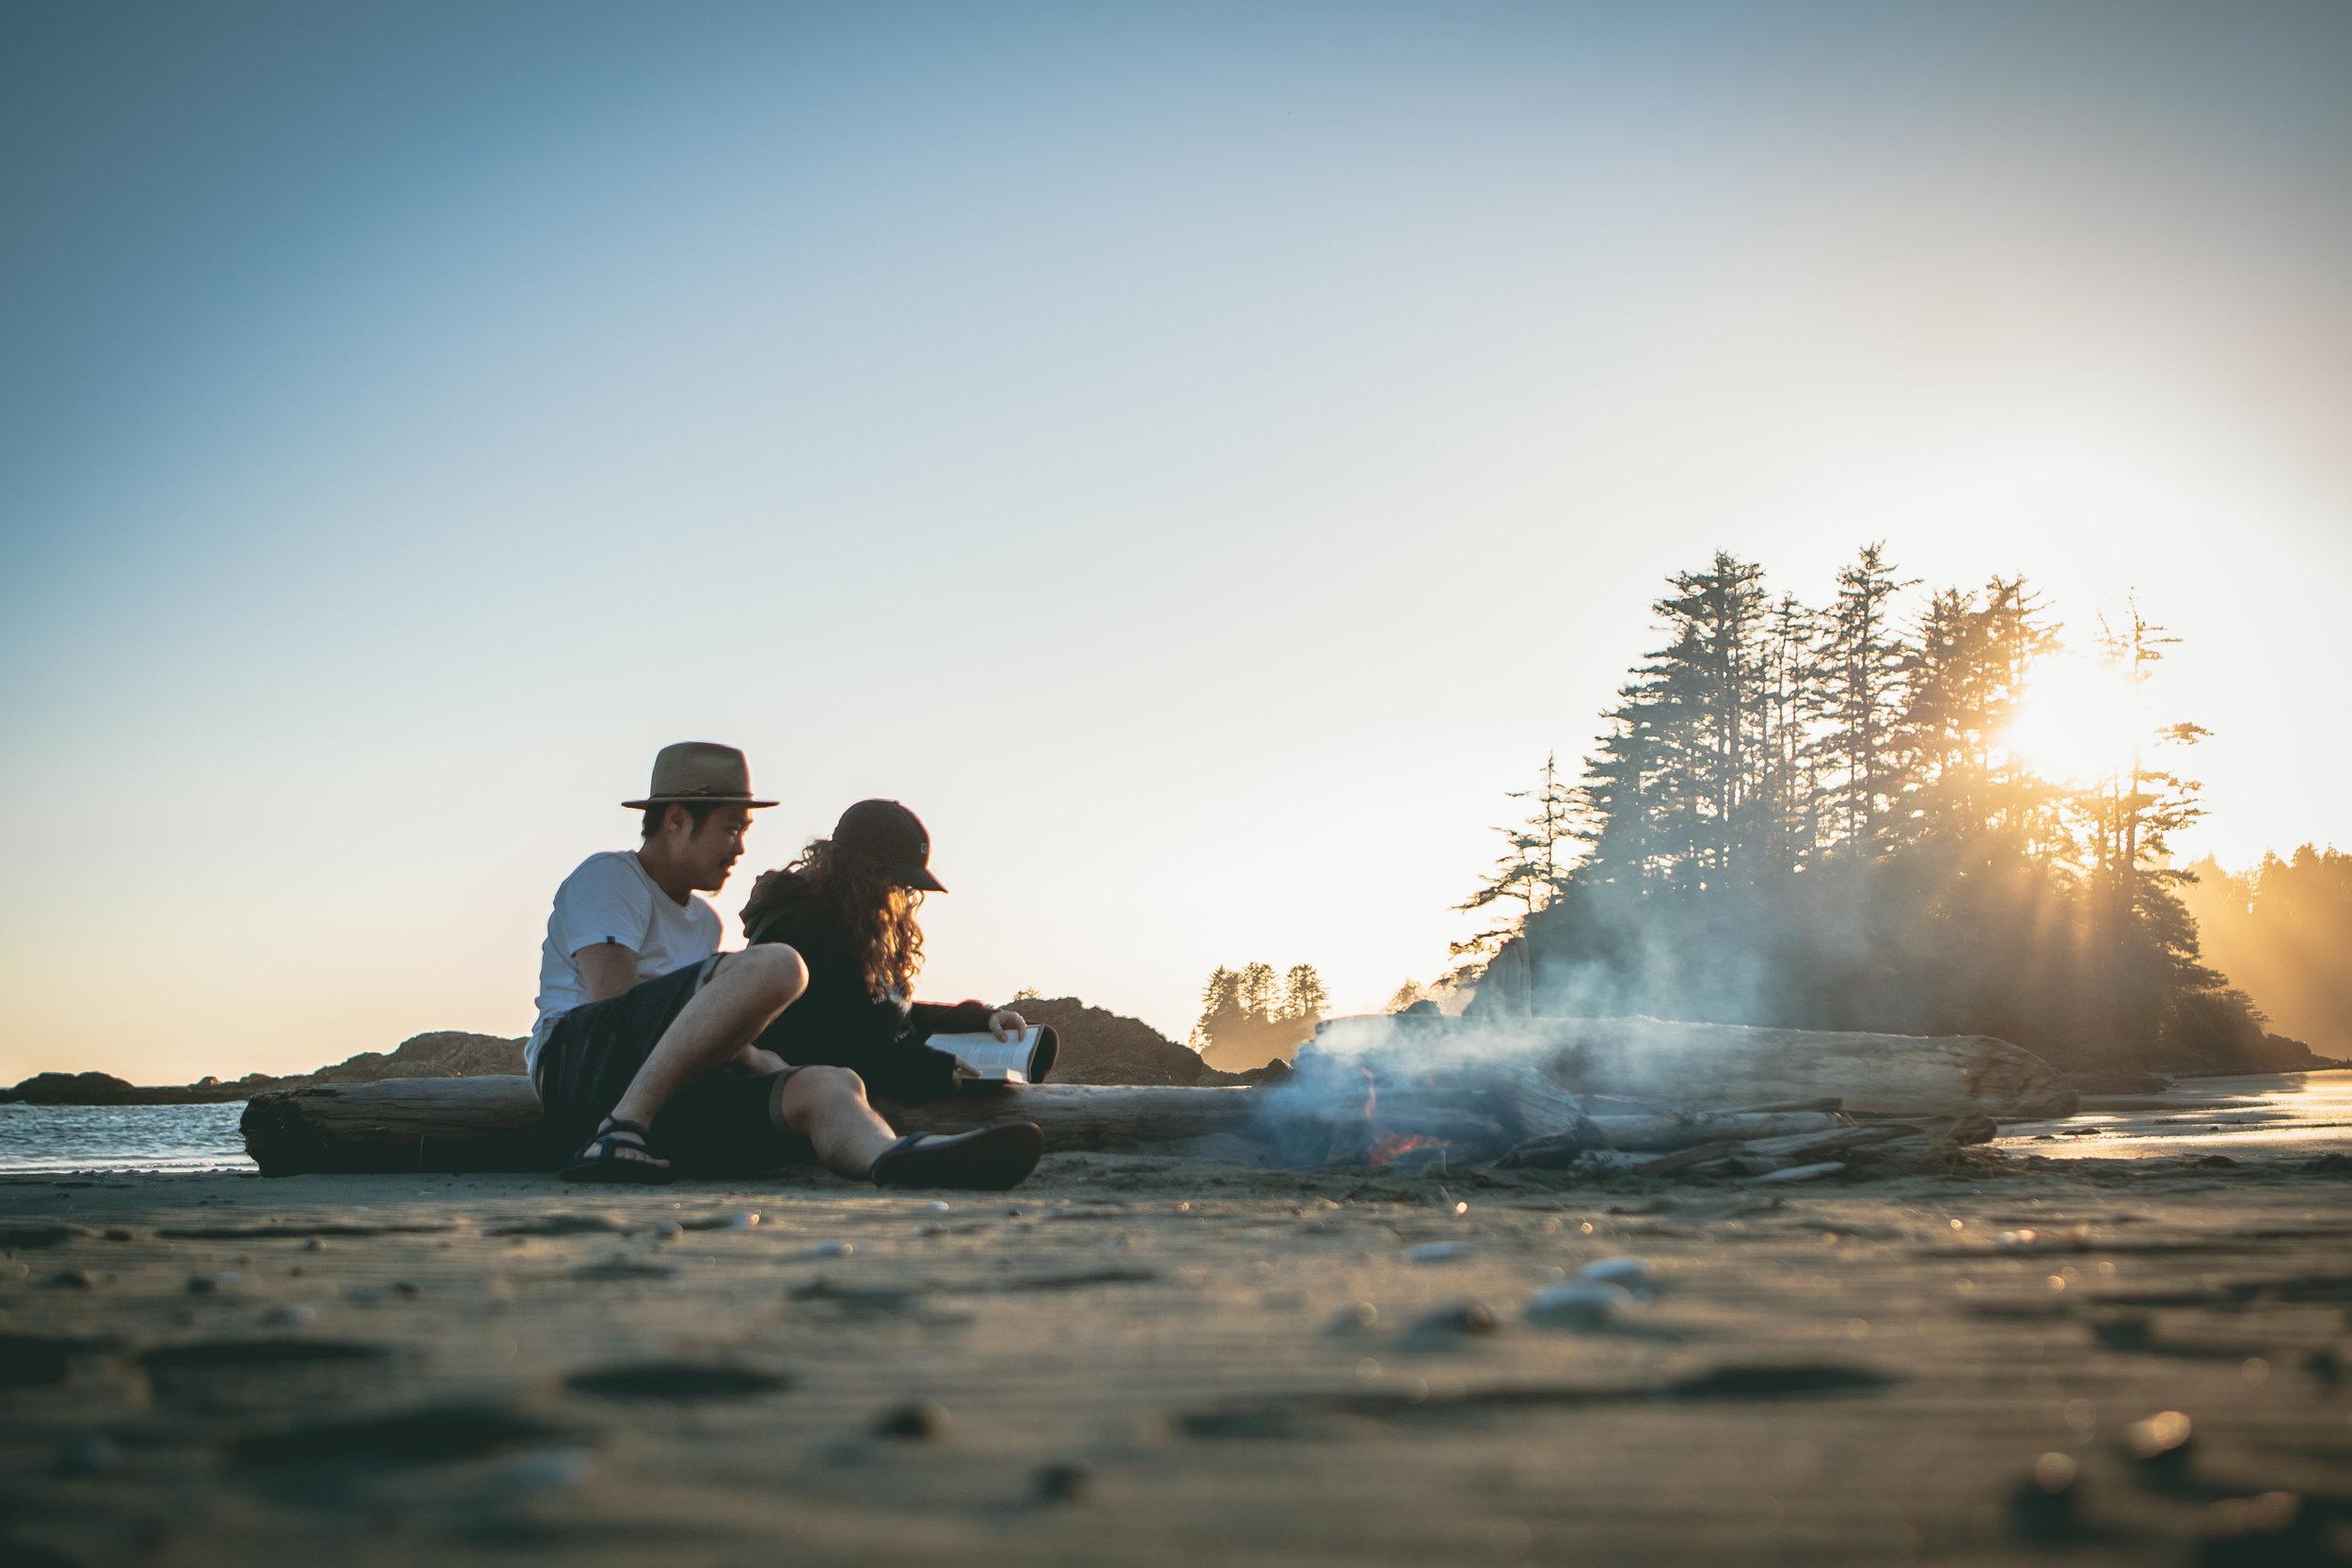 Comps & Camps   Farm trip 2018 When: 22nd December Where: KILLALEA STATE PARK